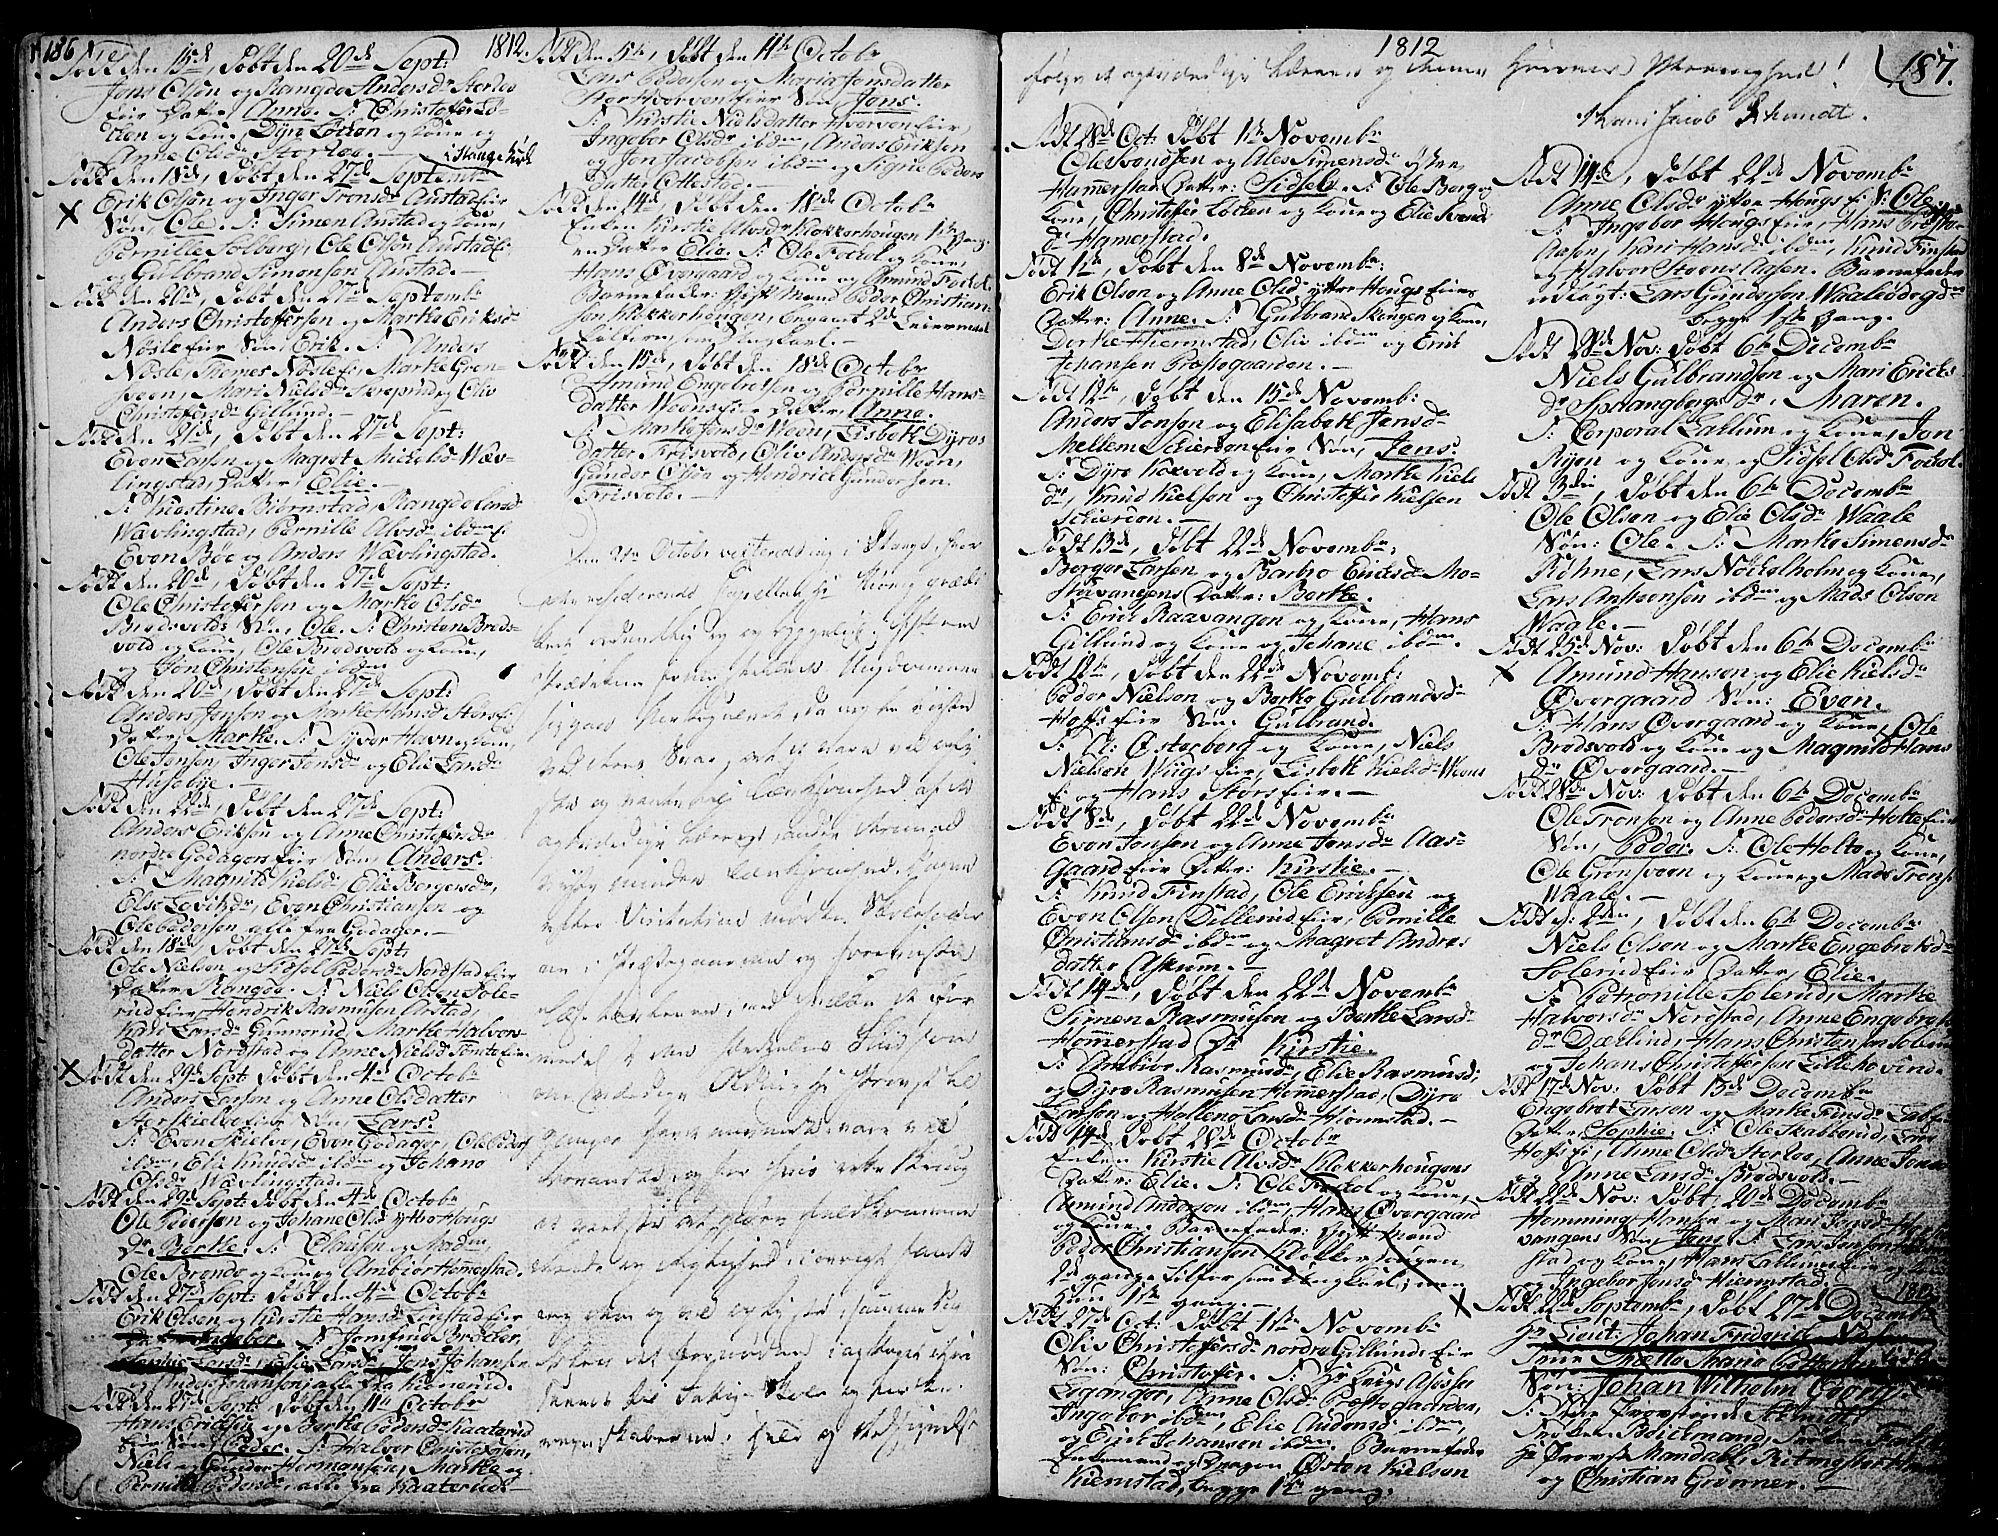 SAH, Stange prestekontor, K/L0007: Ministerialbok nr. 7, 1788-1813, s. 186-187